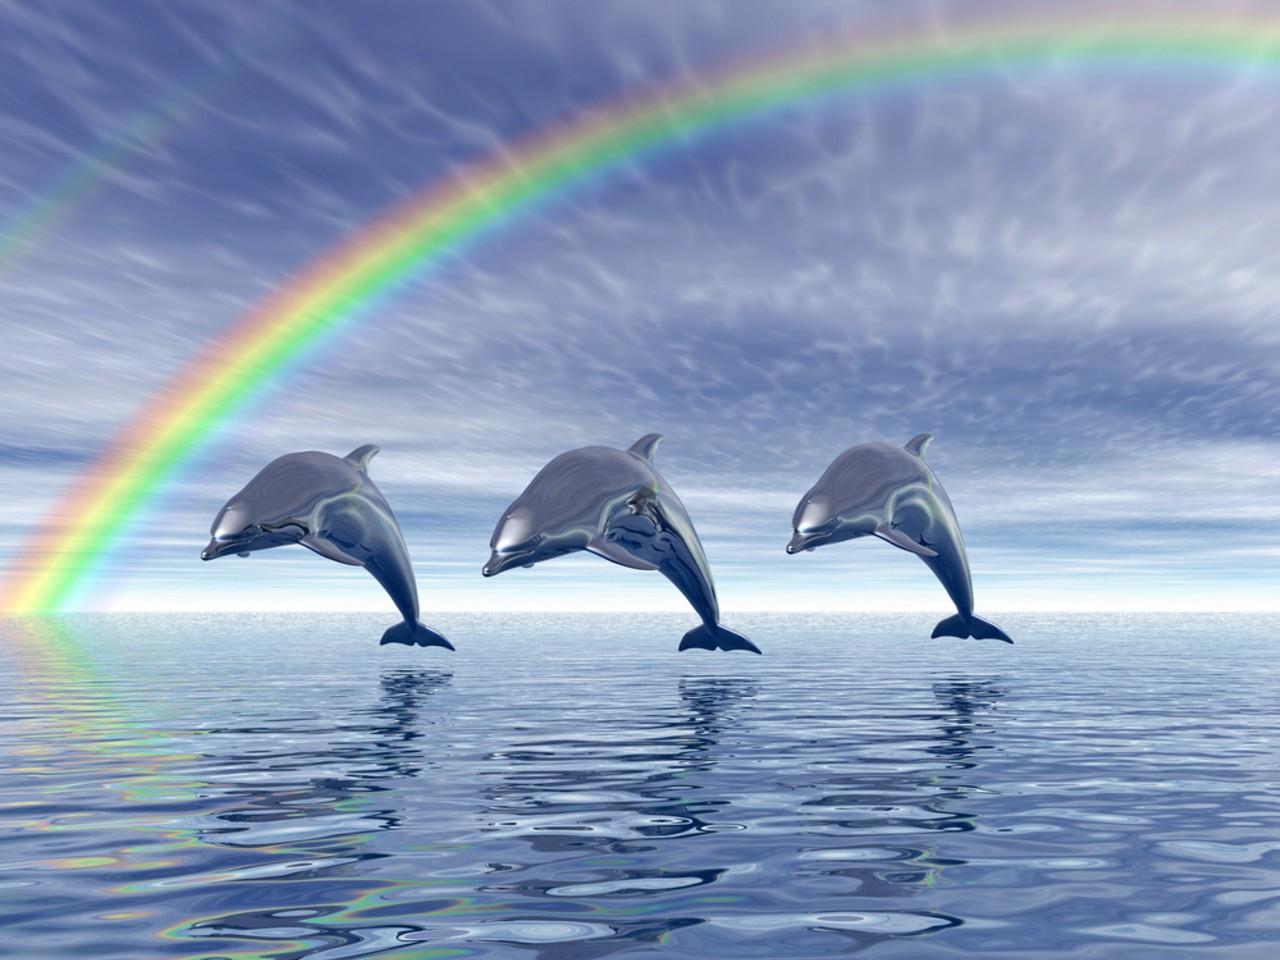 dolphin wallpaper for bedroom